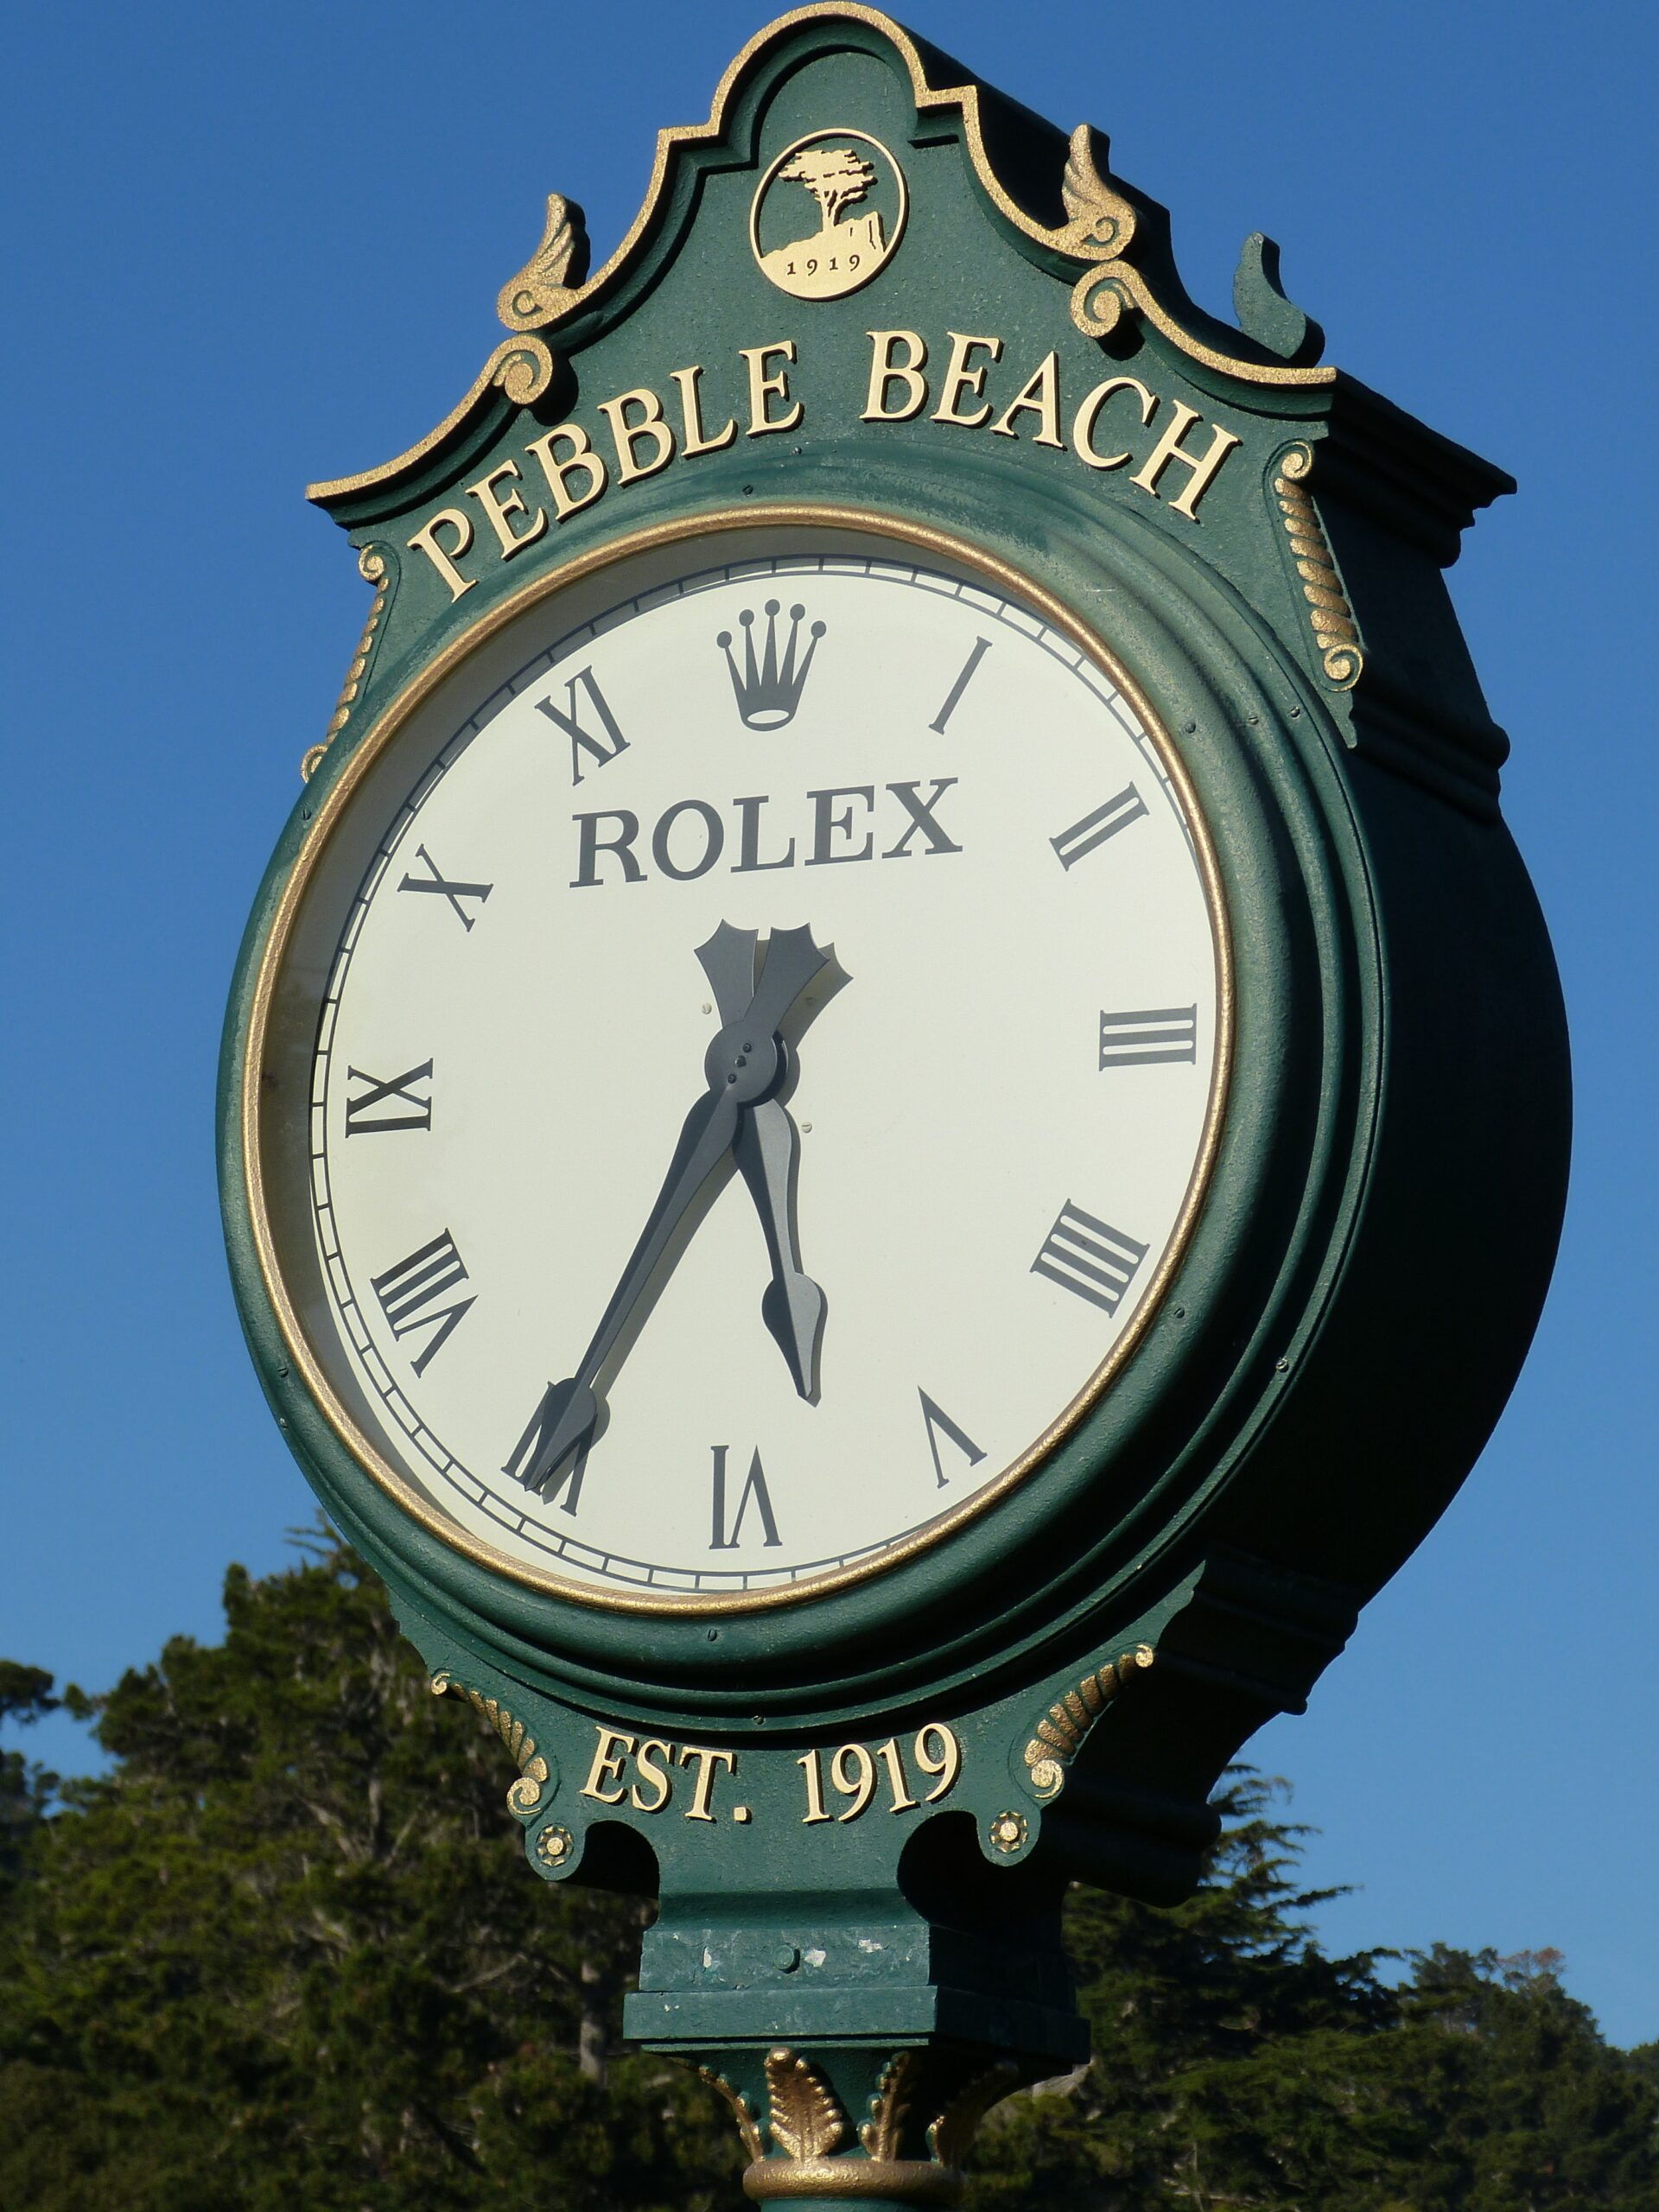 round white and green Rolex Pebble Beach analog clock